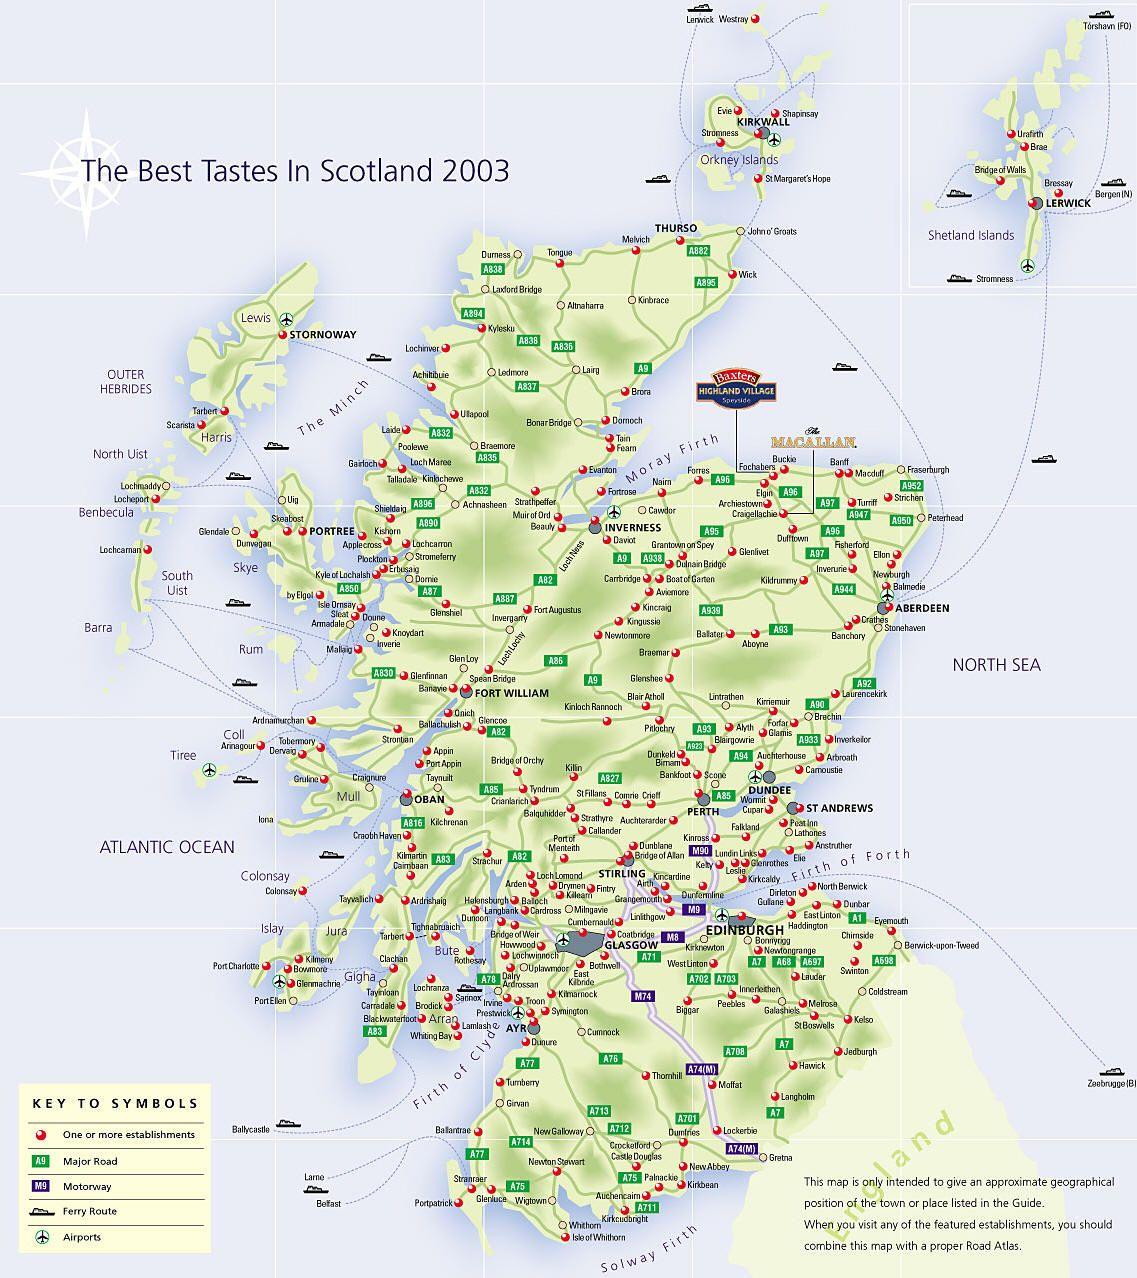 Scozia Cartina Fisica.Mappa Scozia Cartina Della Scozia Scozia Viaggio In Scozia Mappa